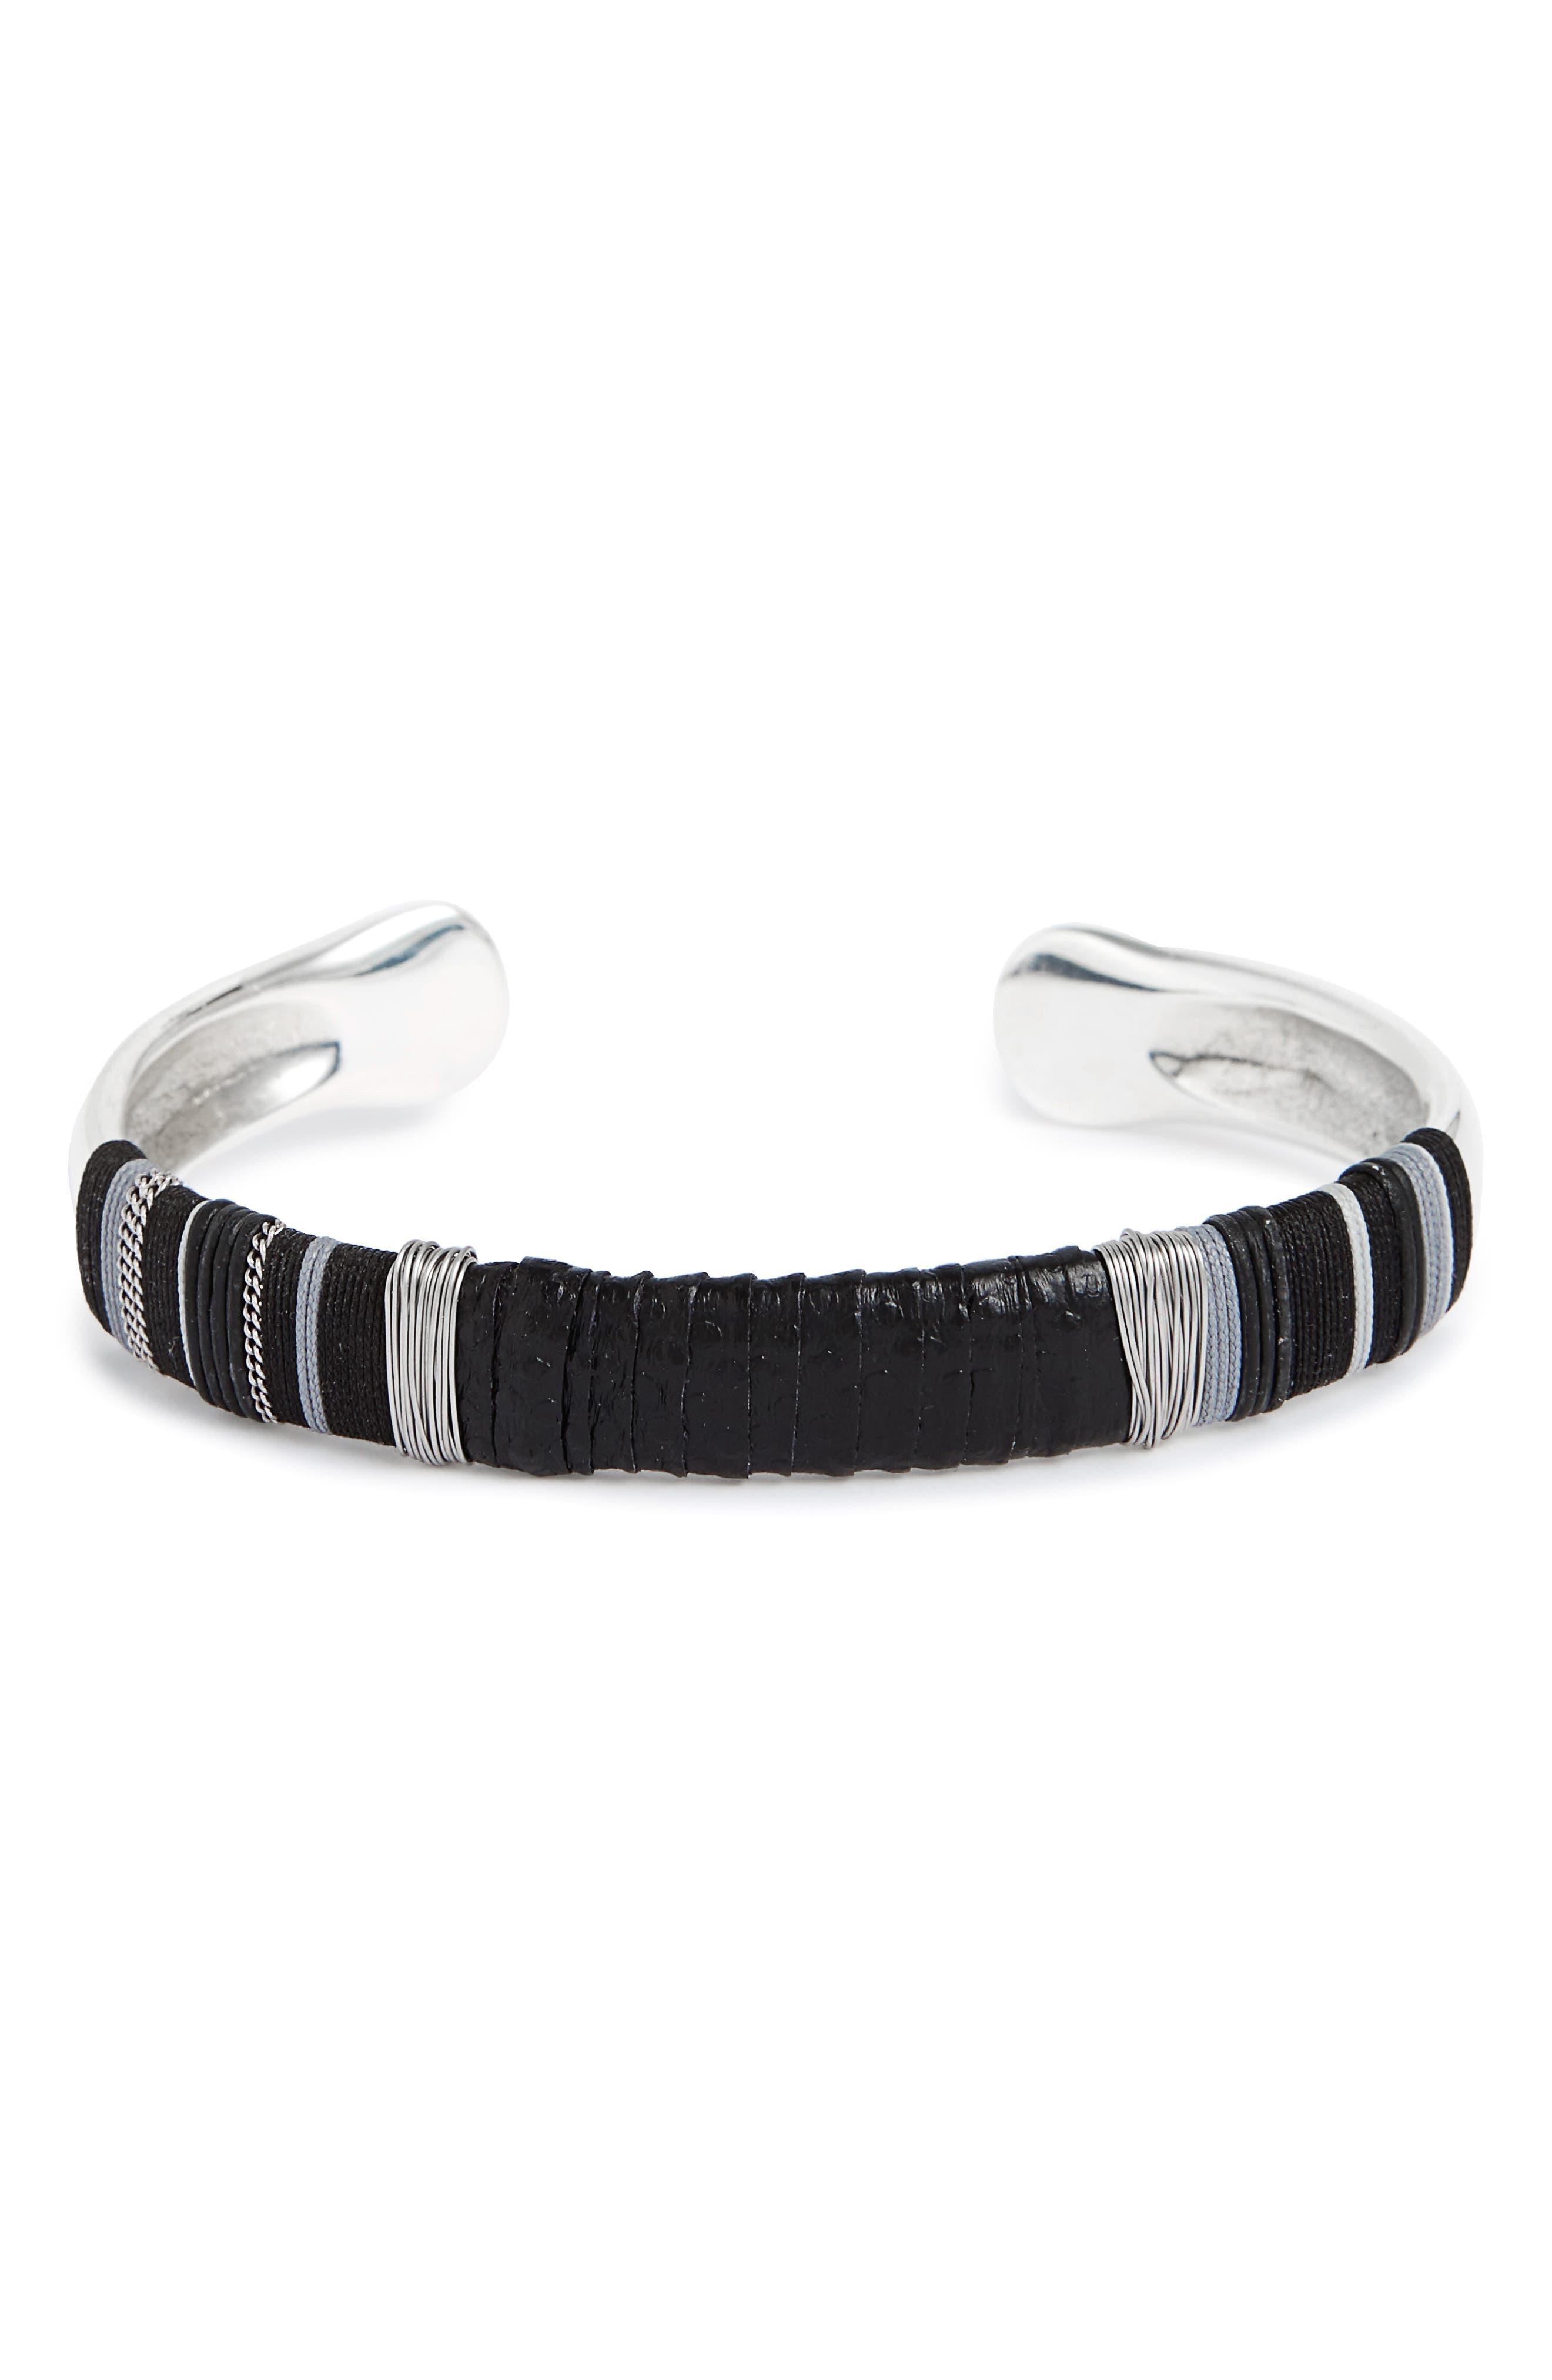 Massai Snakeskin Cuff Bracelet,                         Main,                         color, Black